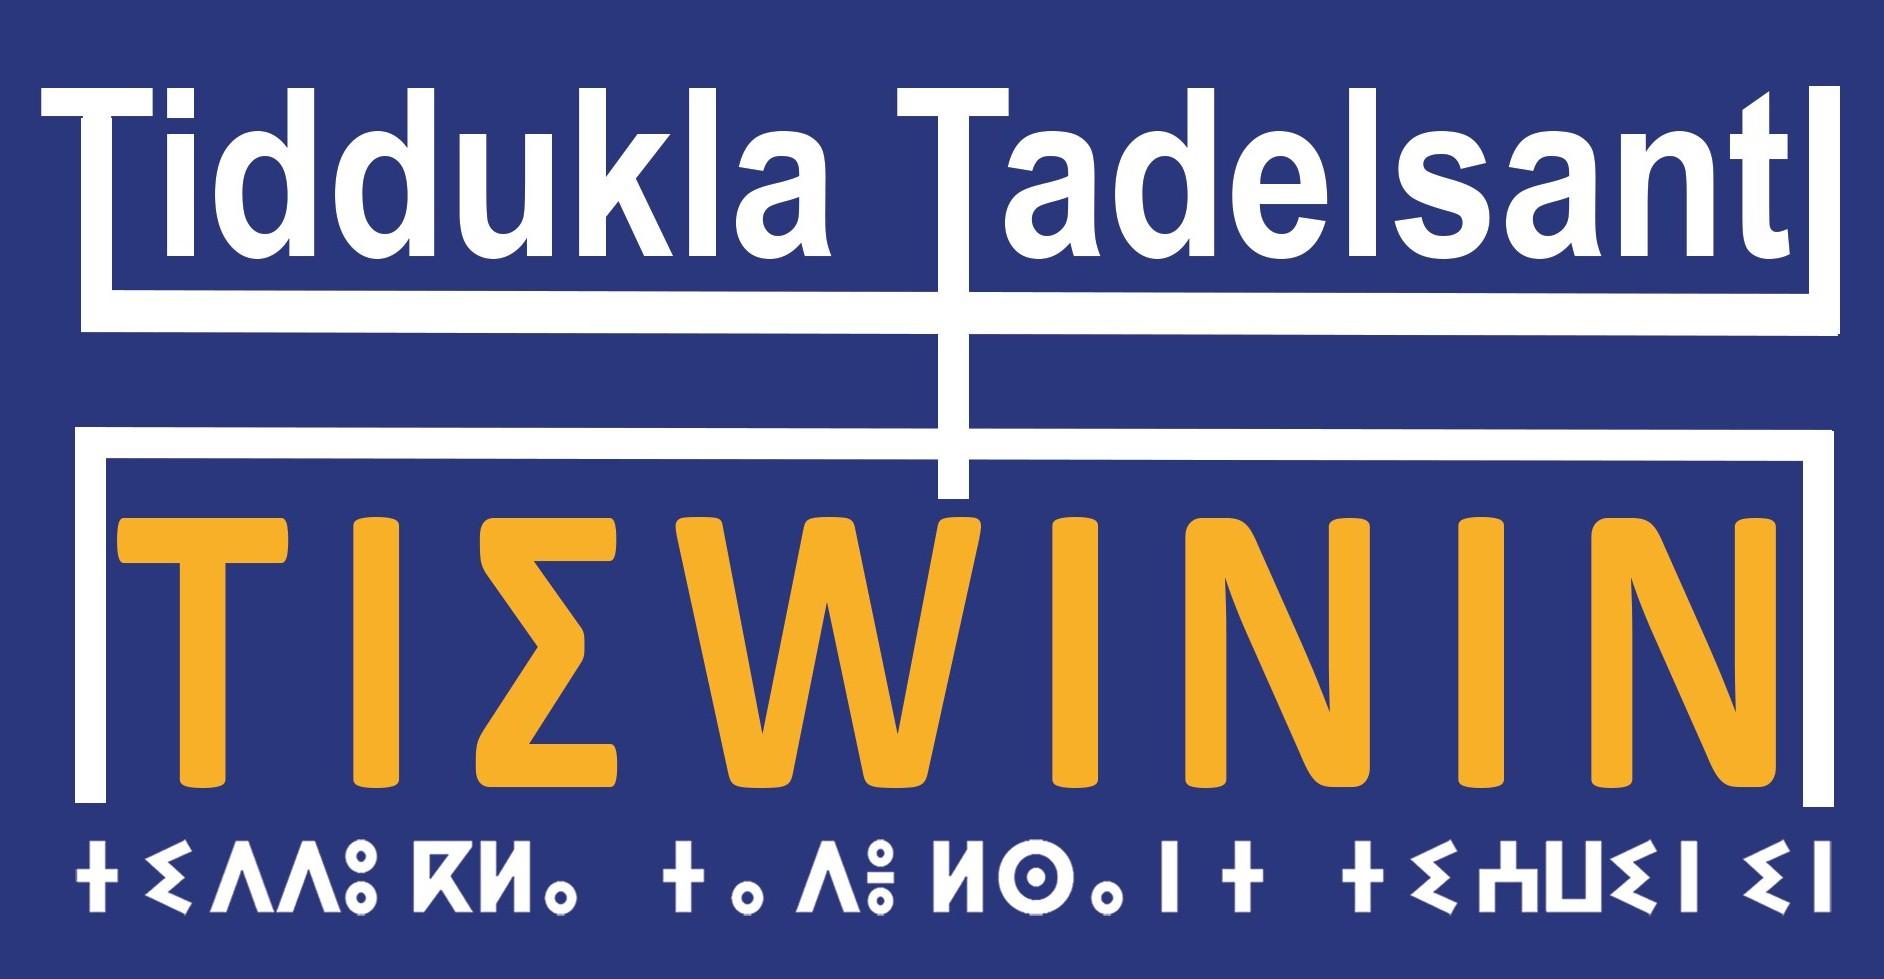 Tiddukla Tadelsant T...